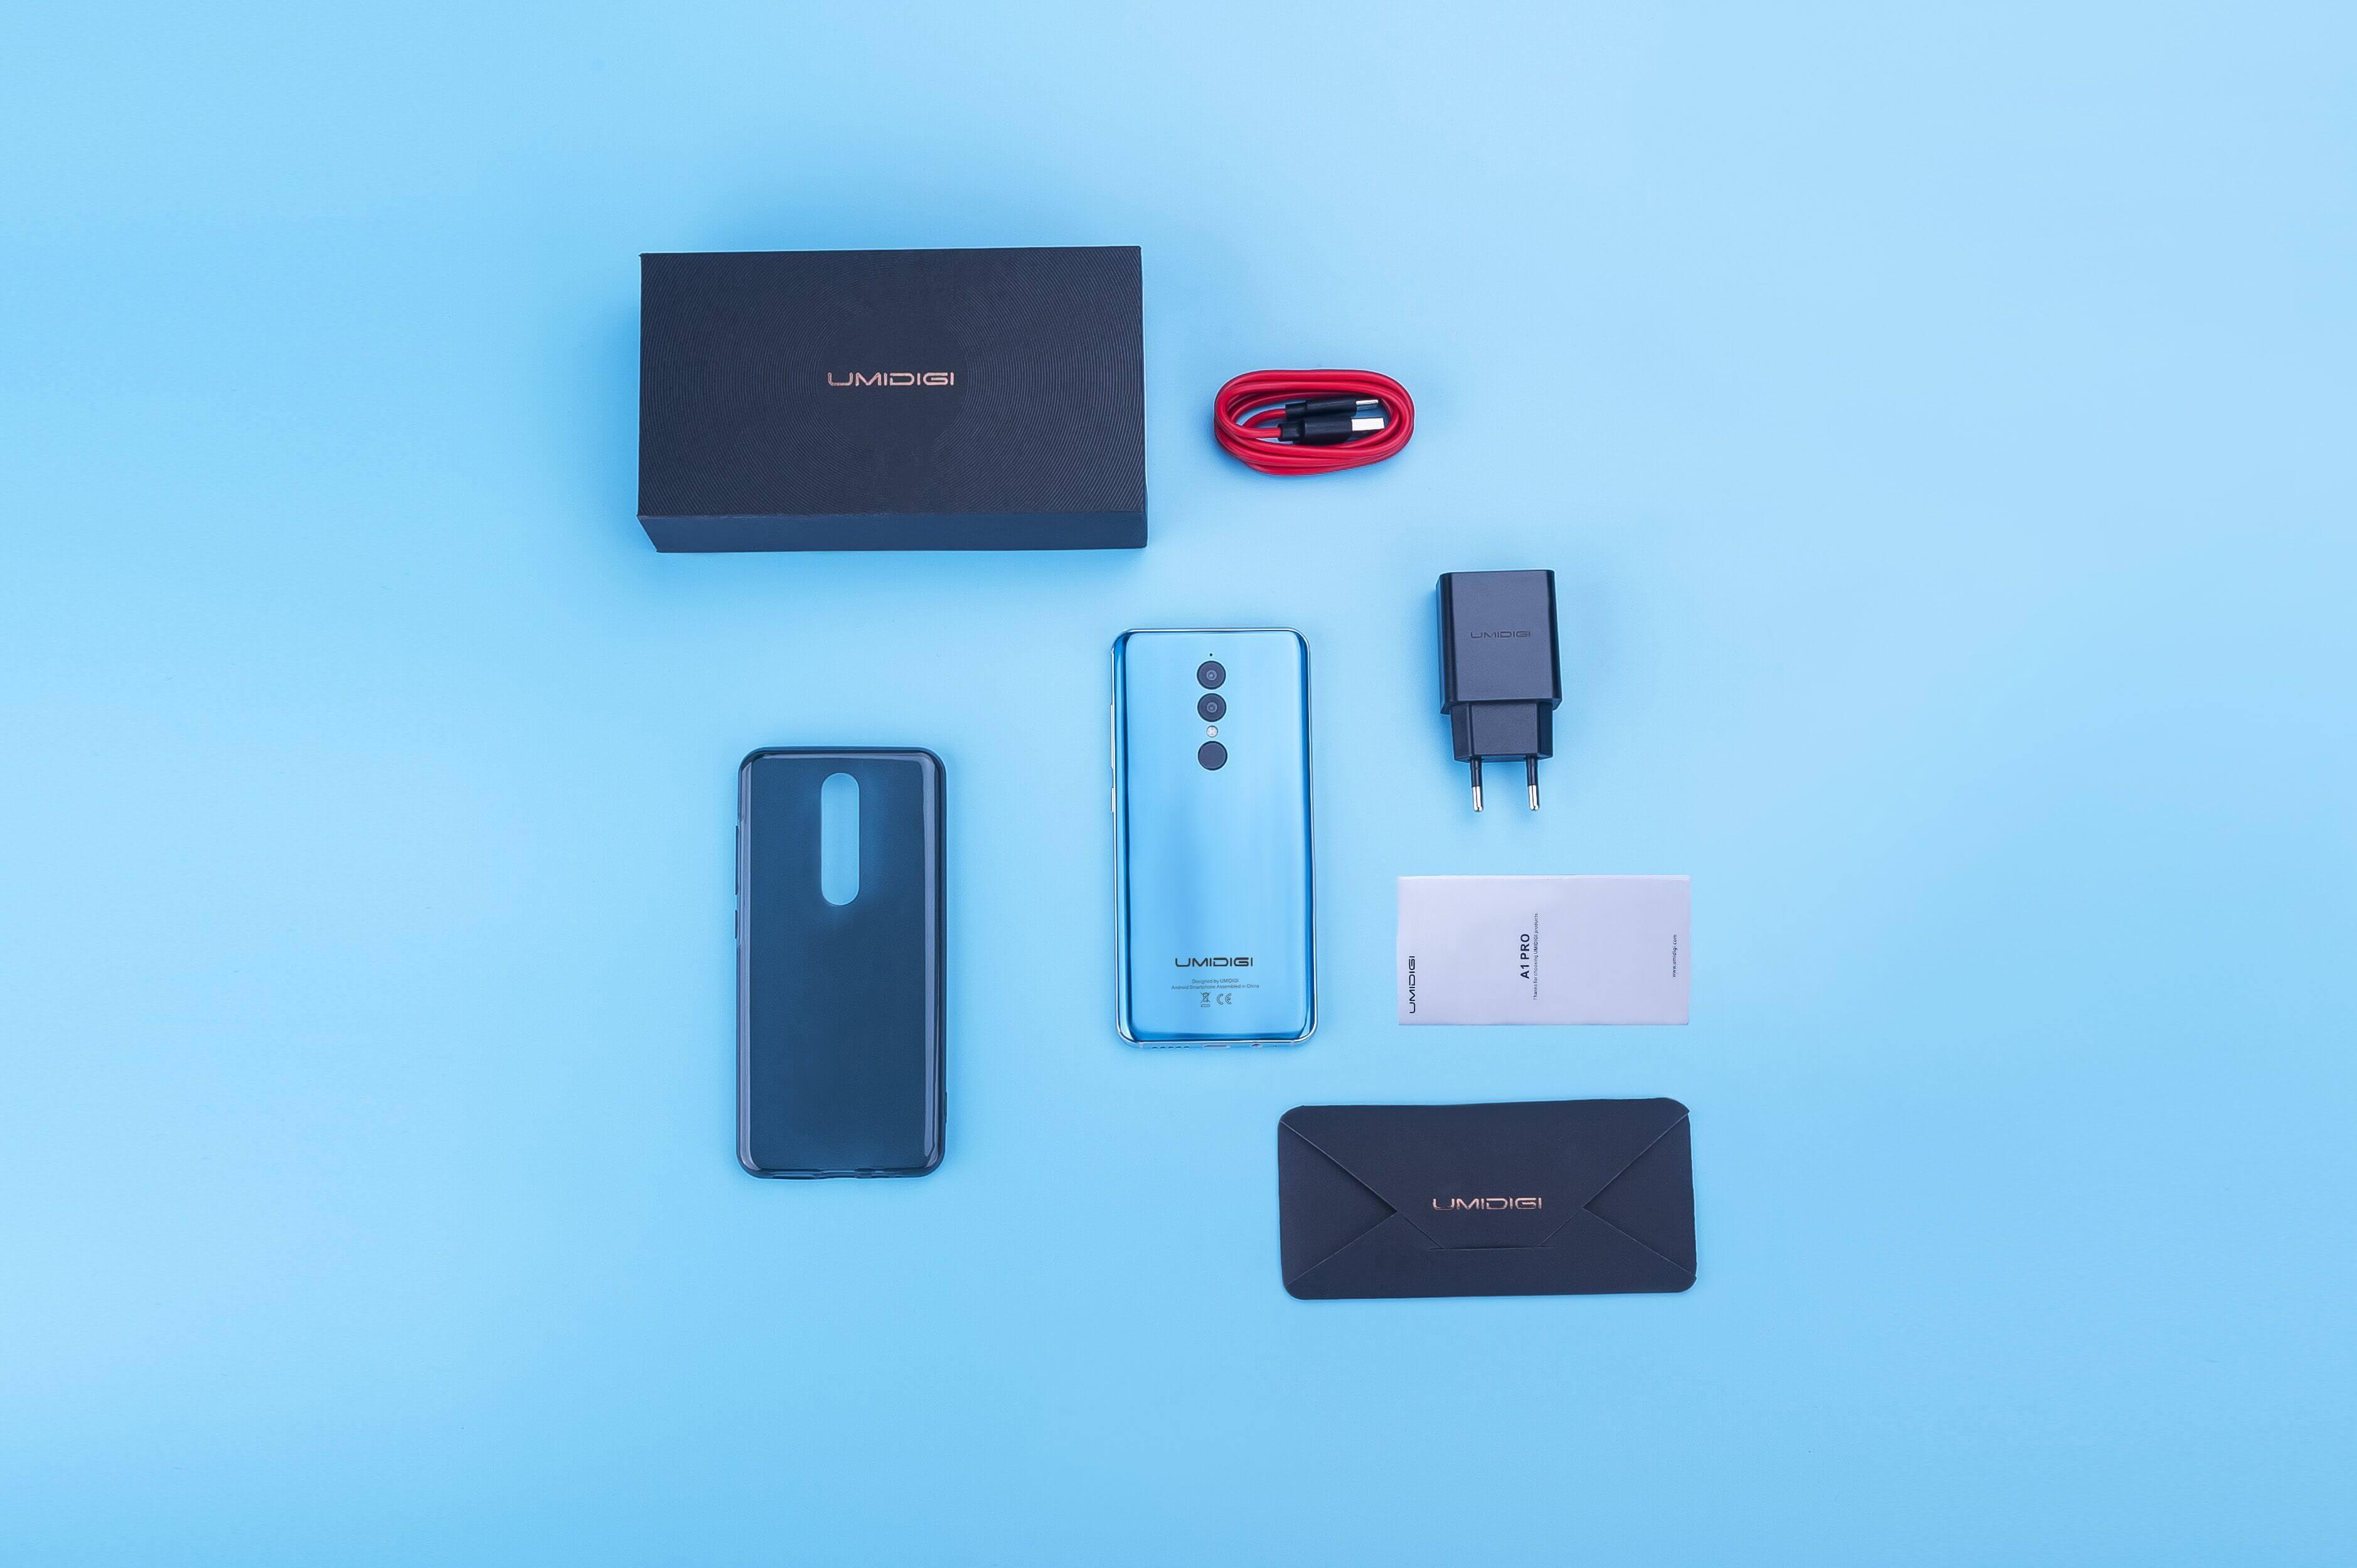 UMIDIGI A1 Pro Vorverkauf begonnen, 50 Dollar Nachlass techboys.de • smarte News, auf den Punkt!